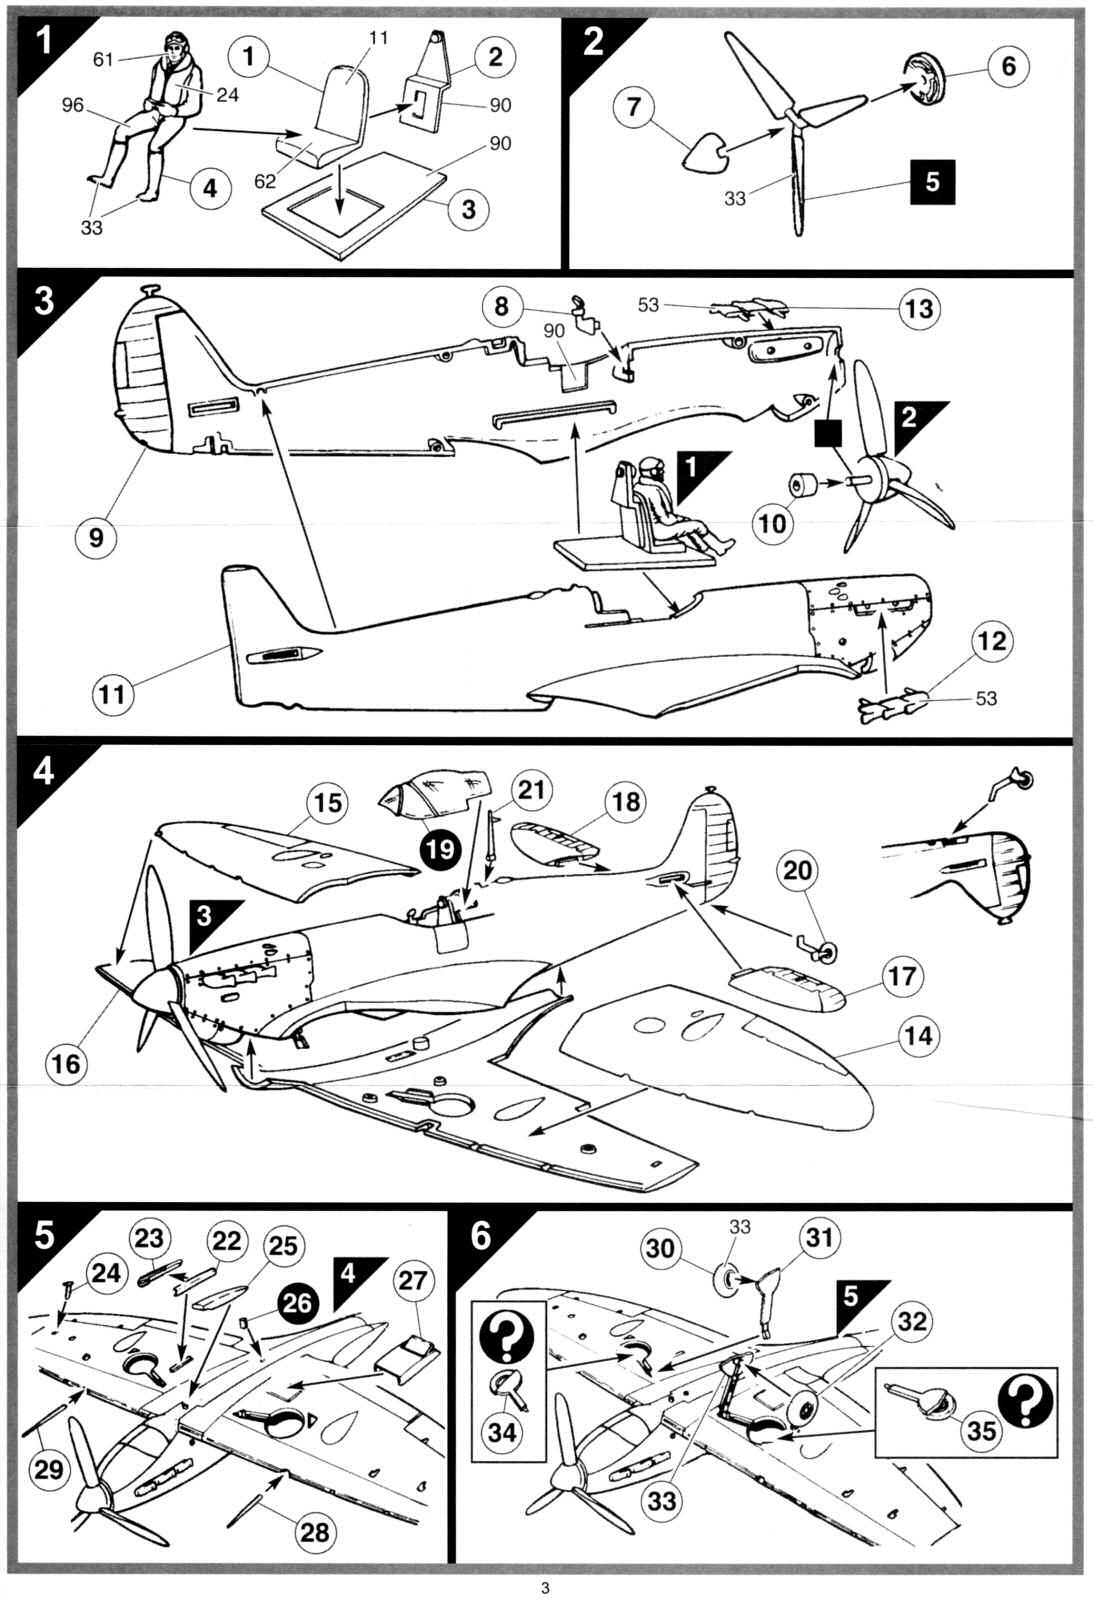 airfix supermarine spitfire mk1a instructions